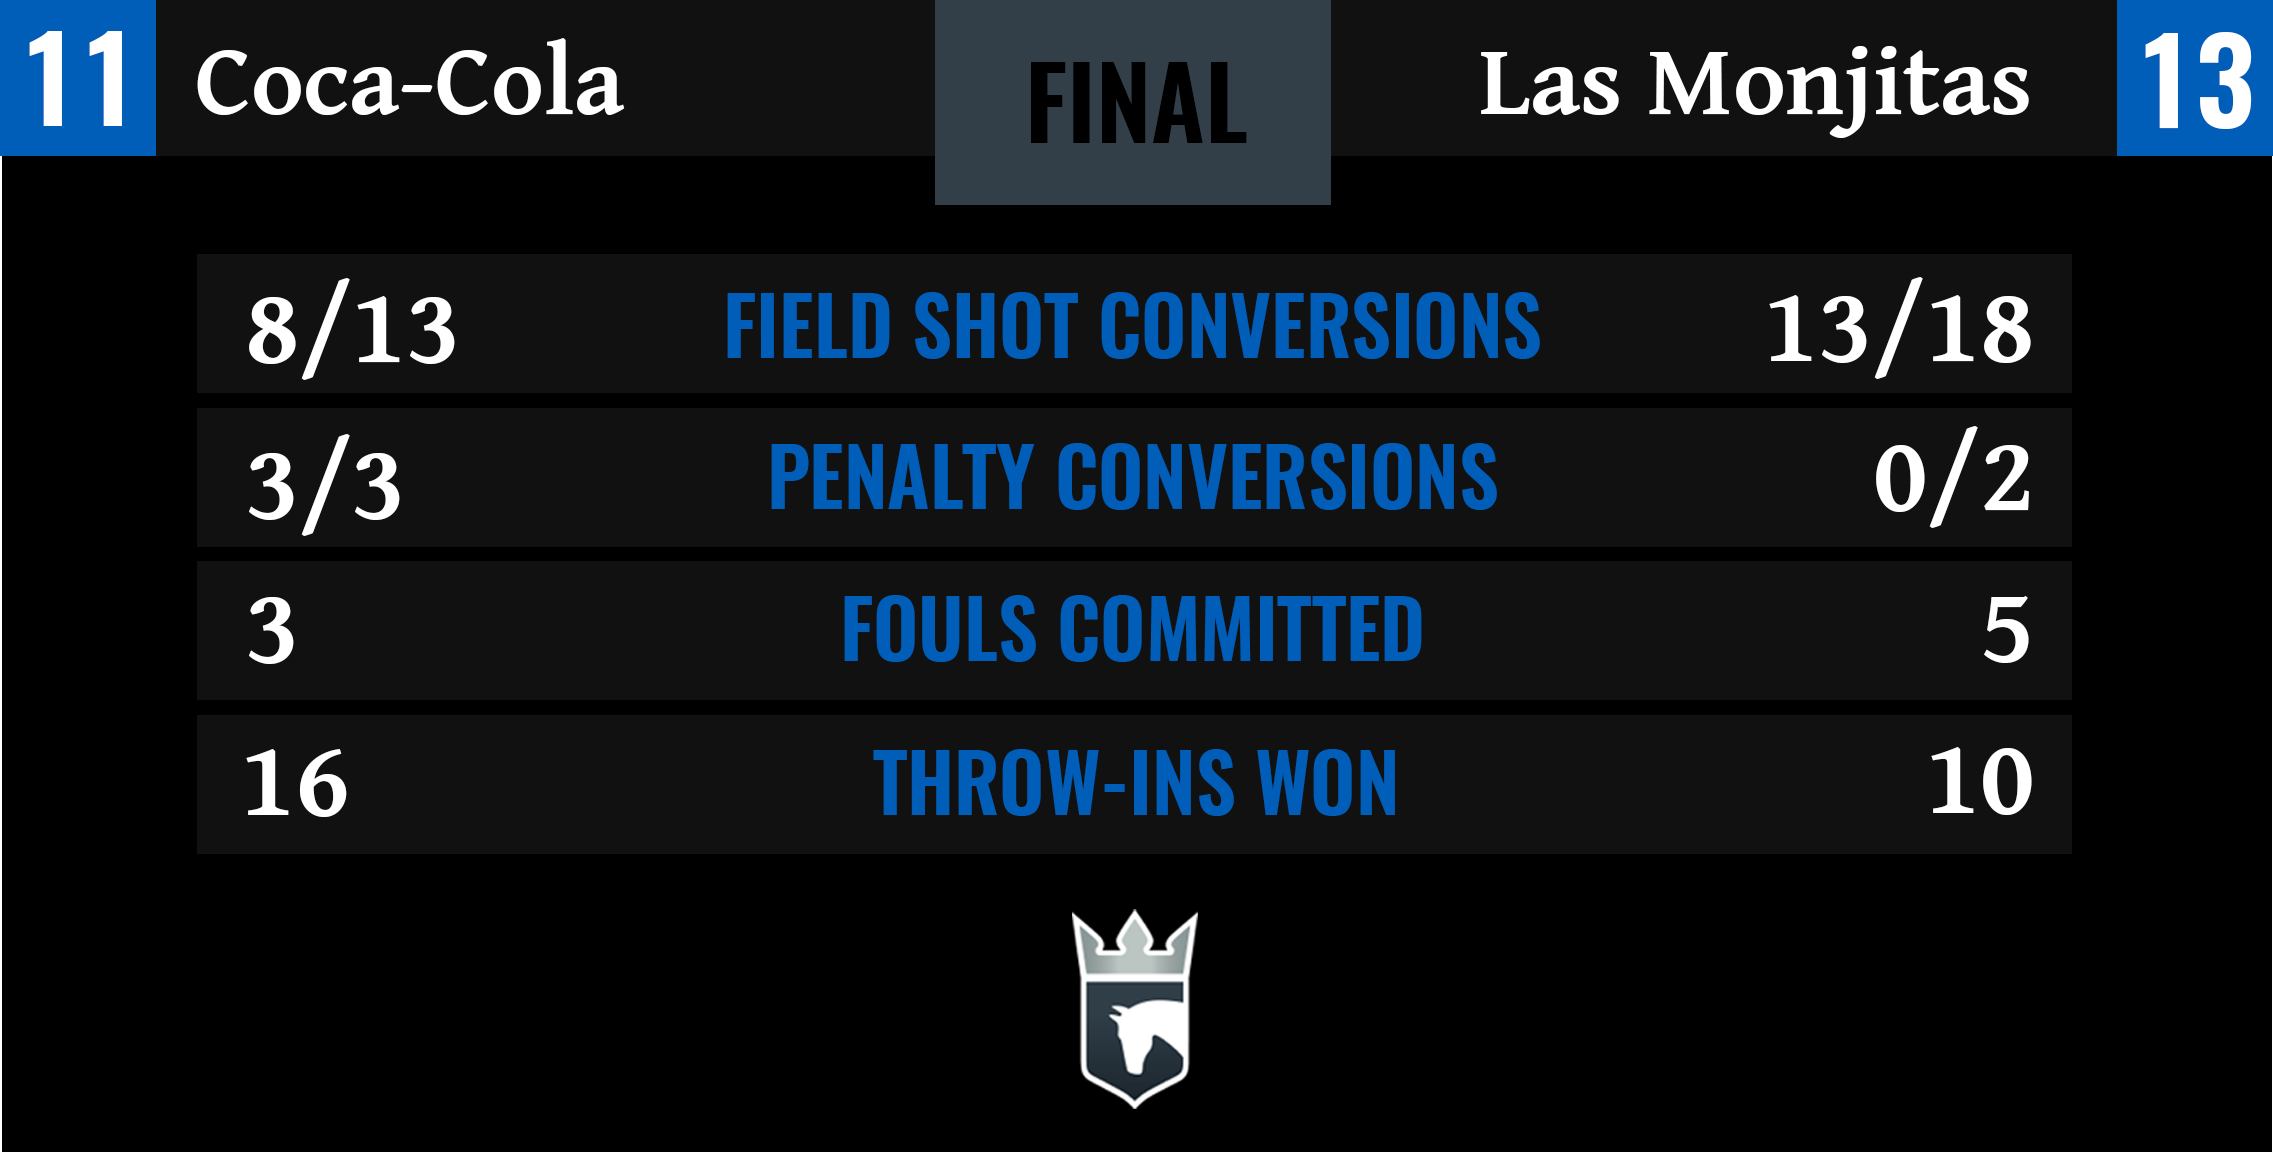 Coca-Cola vs Las Monjitas Final Stats